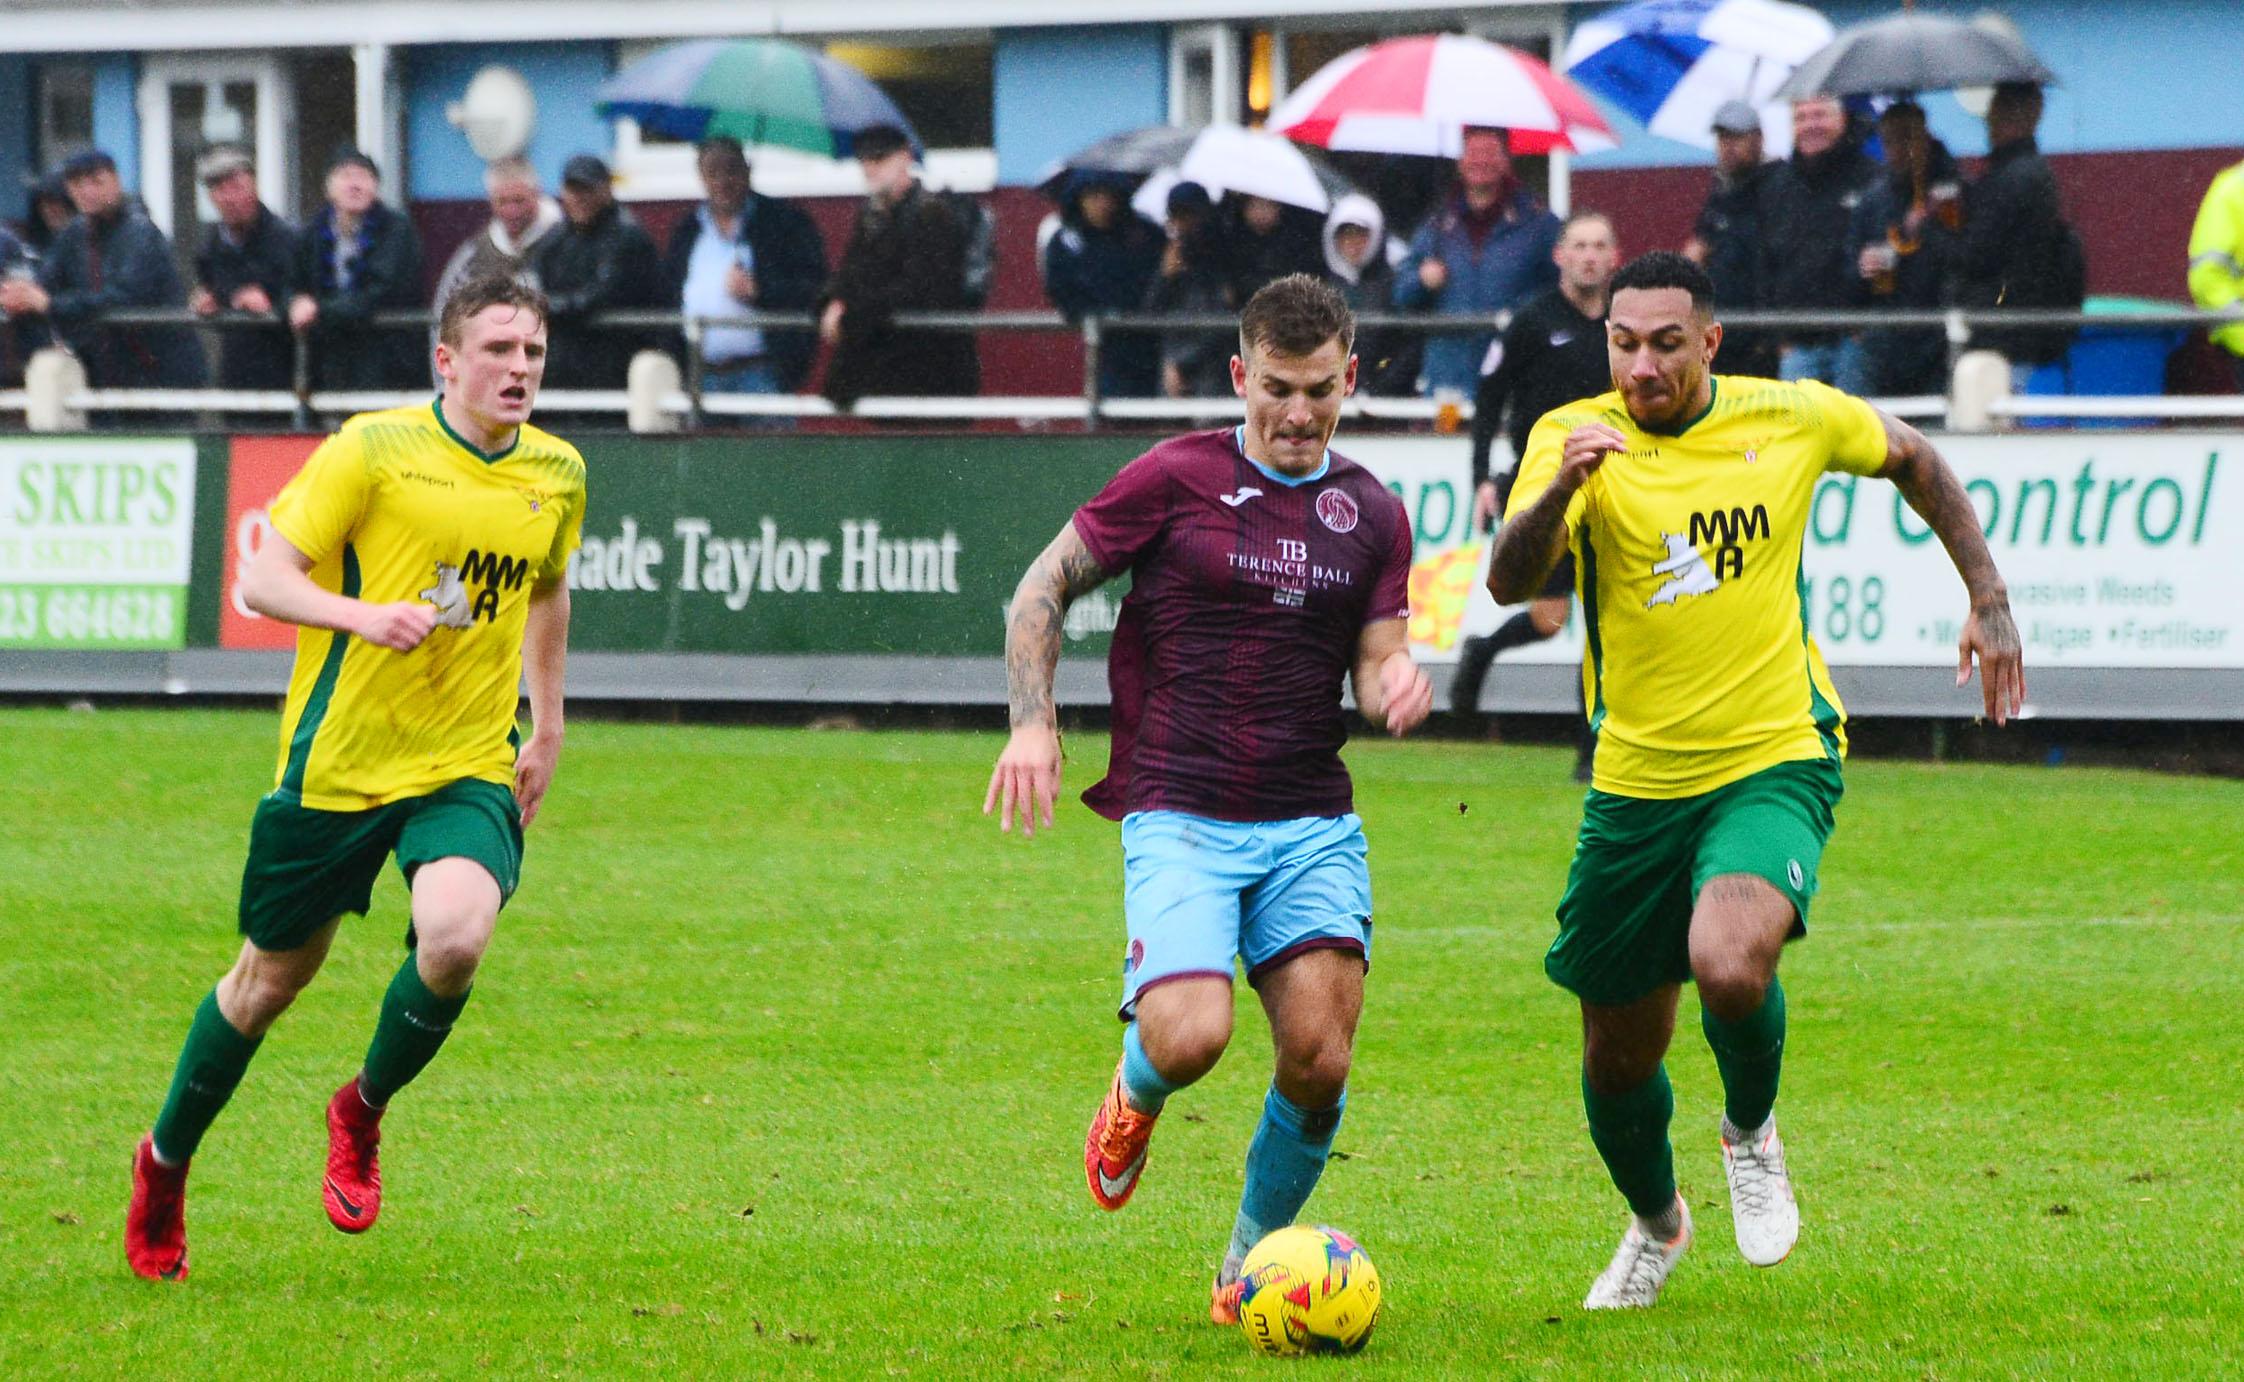 FOOTBALL: Ollie Chamberlain sent off as Taunton Town lose at Gosport Borough